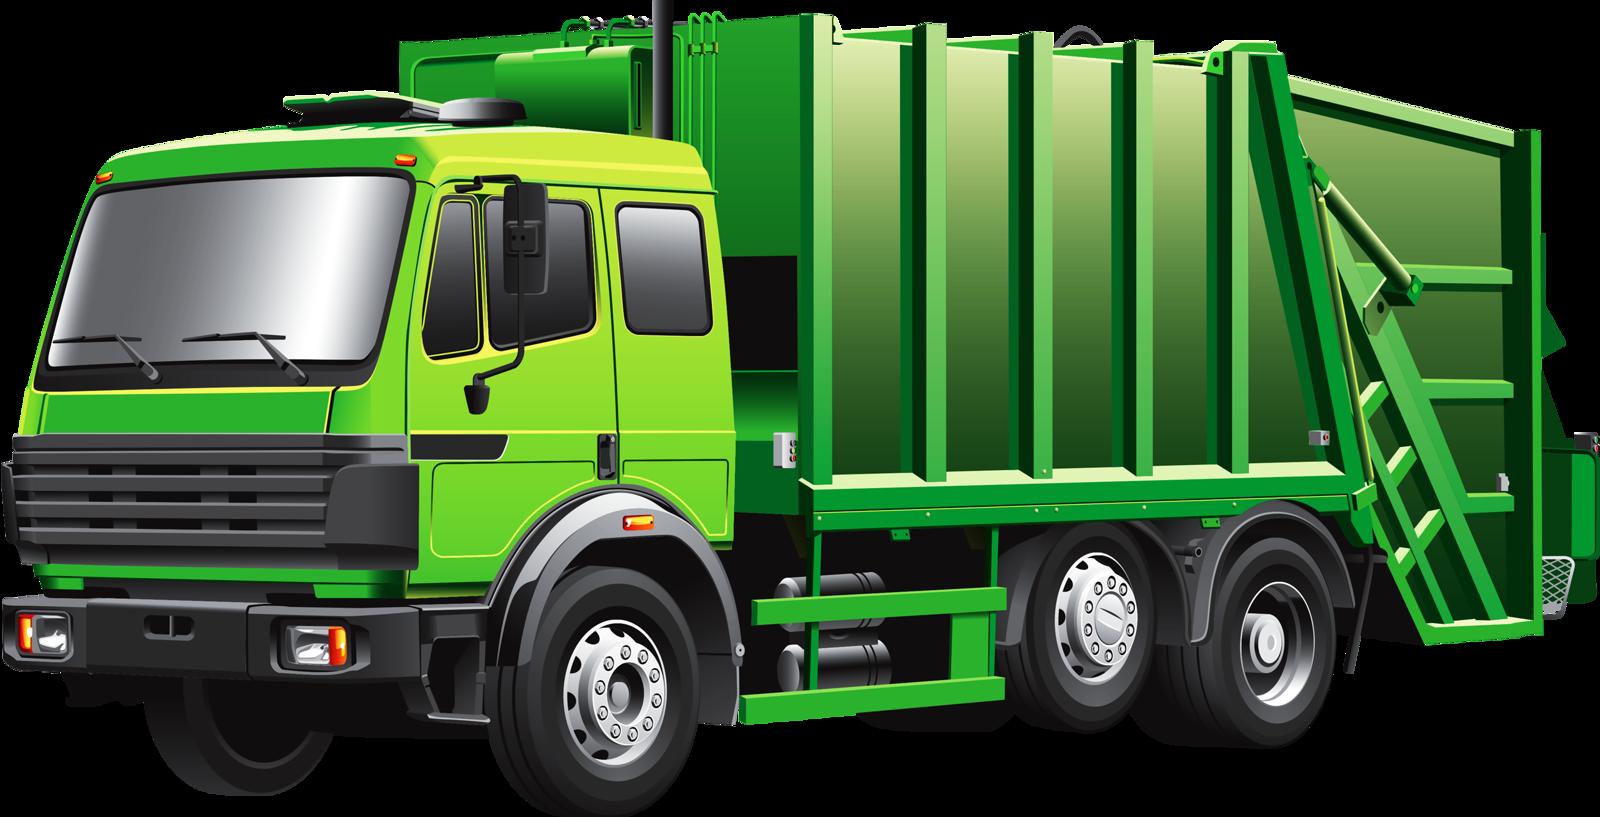 Garbage clipart track.  clip art transportation